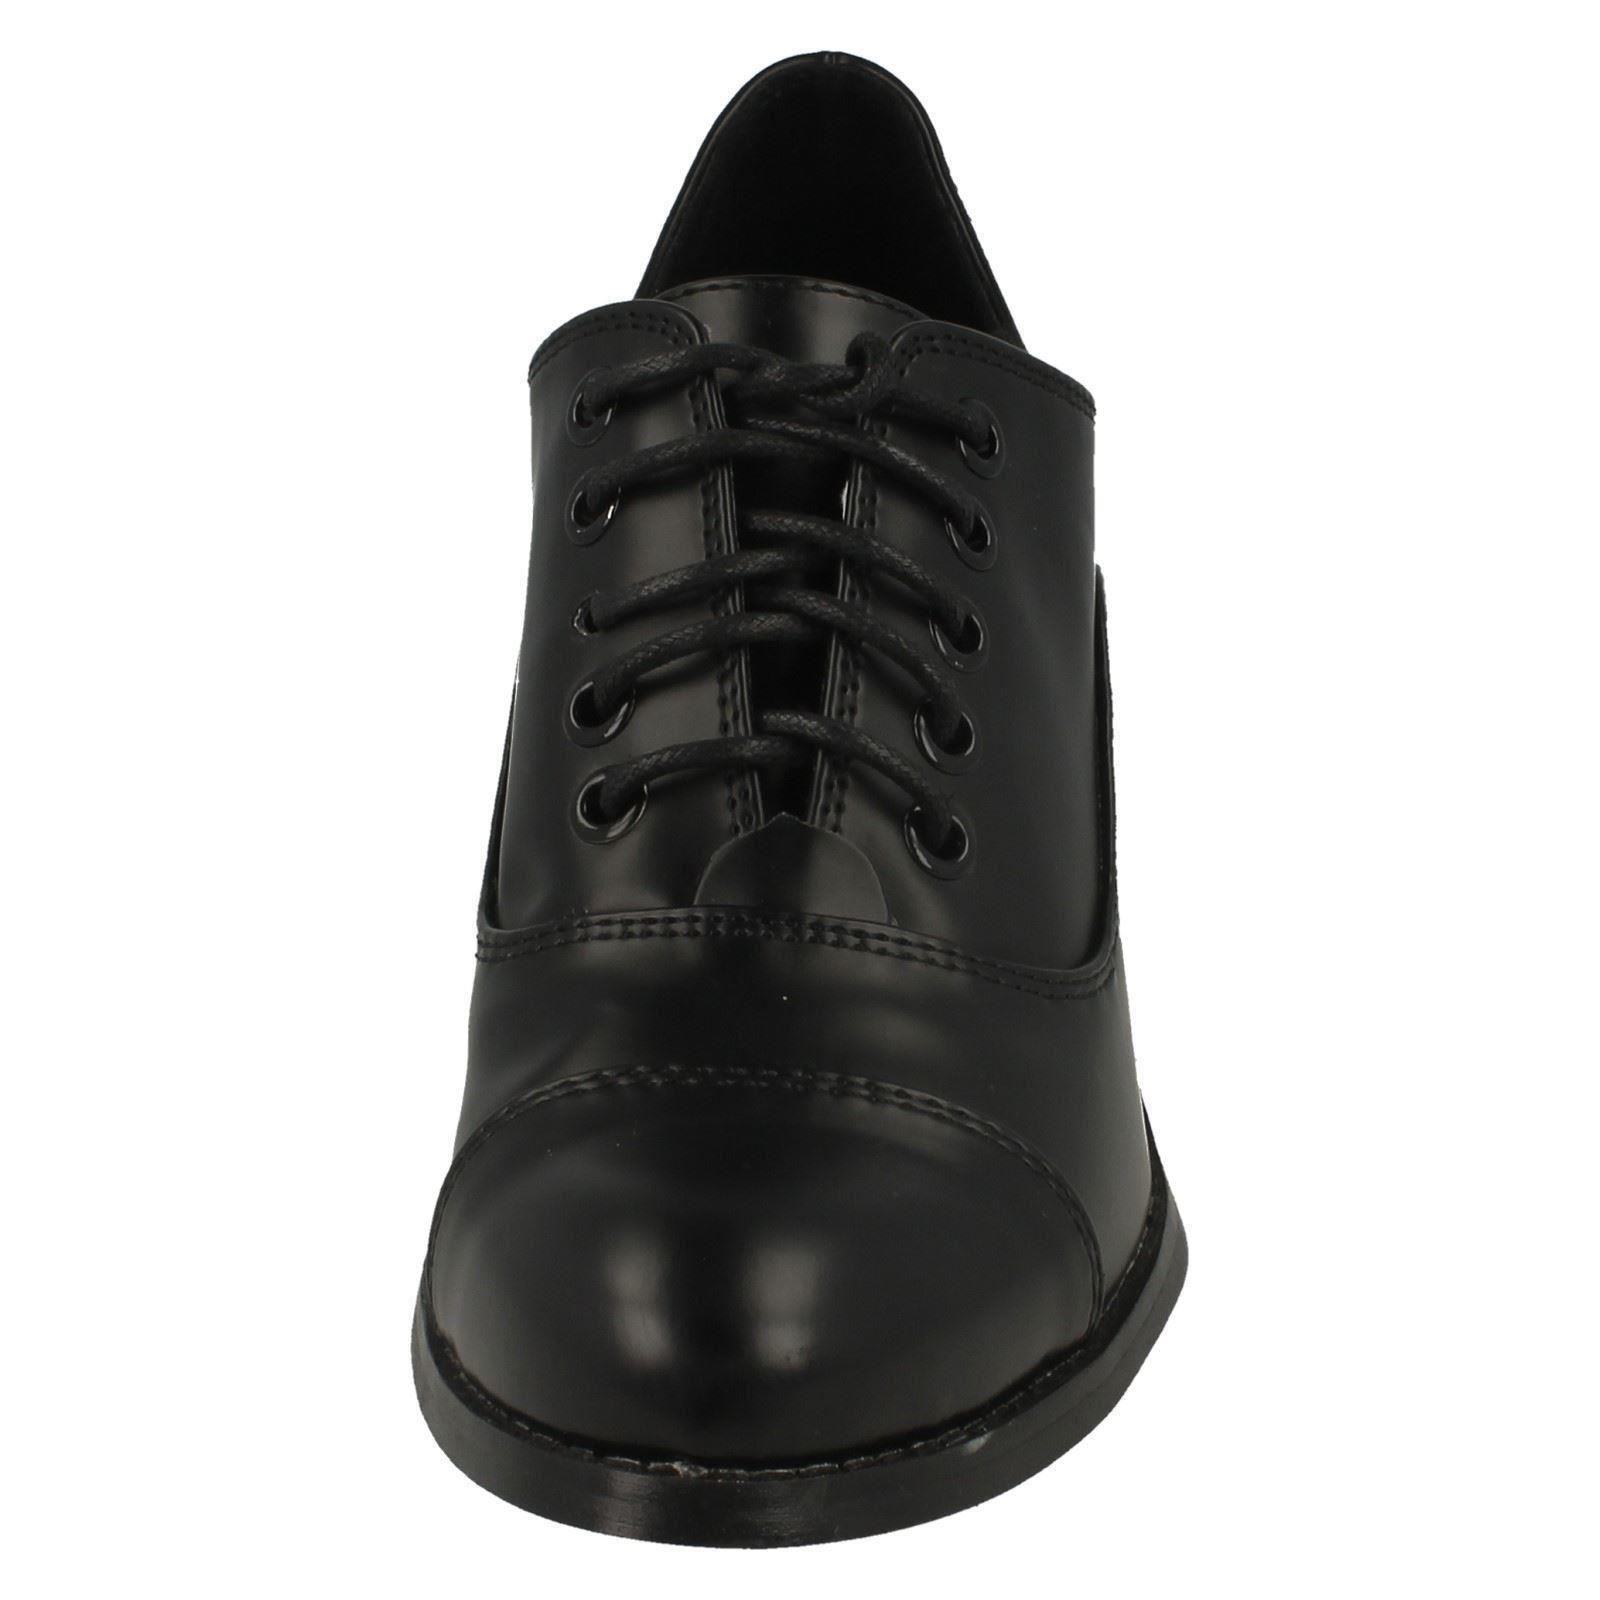 Ladies Spot On Blocked Heel Shoes